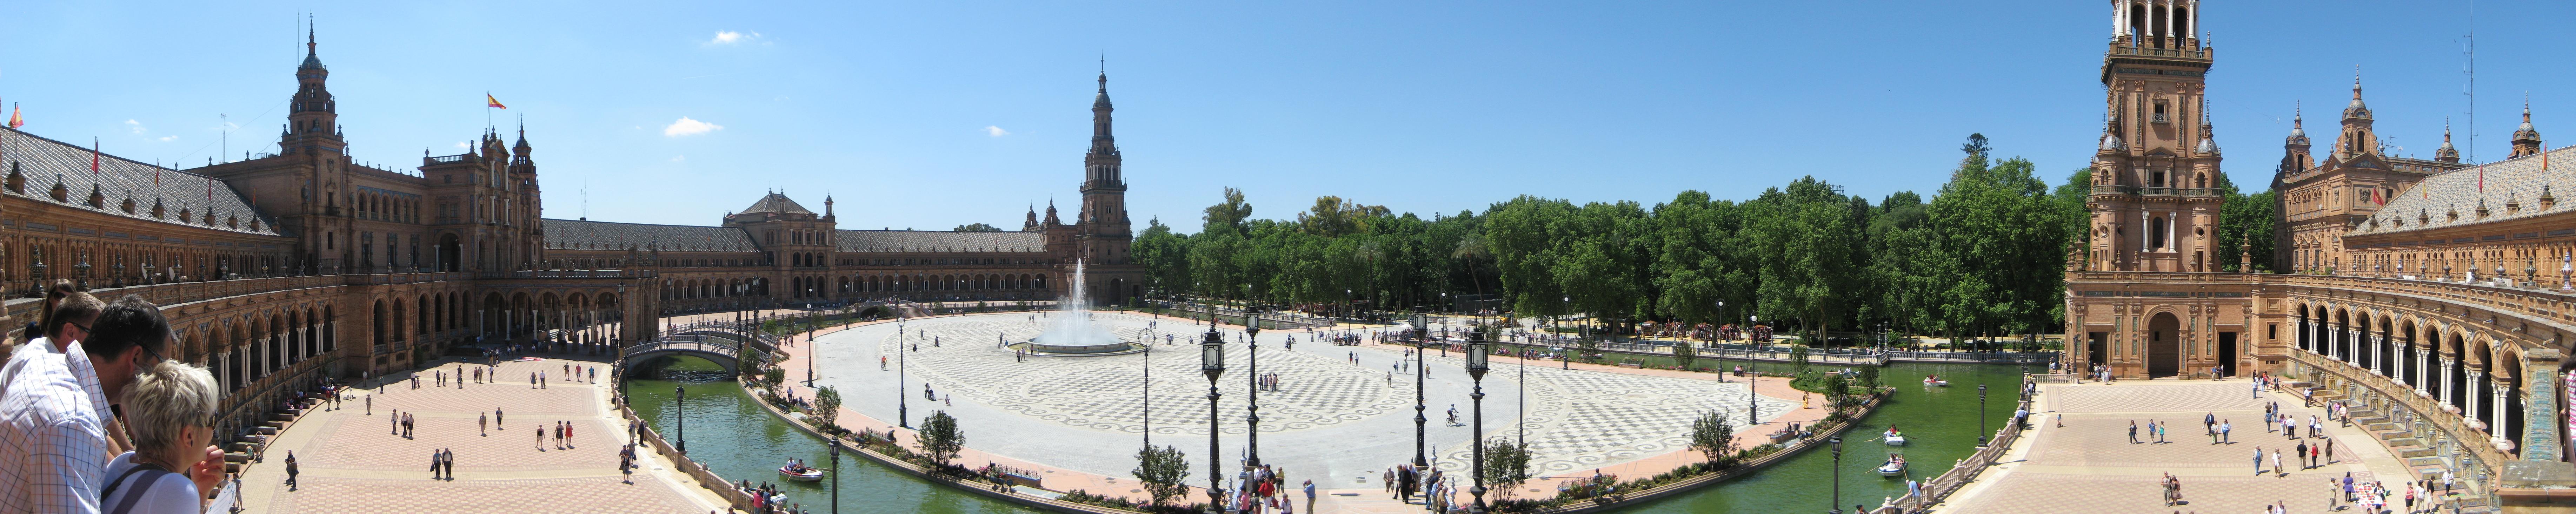 https://upload.wikimedia.org/wikipedia/commons/d/dd/Plaza_de_Espana_-_Sevilla.jpg